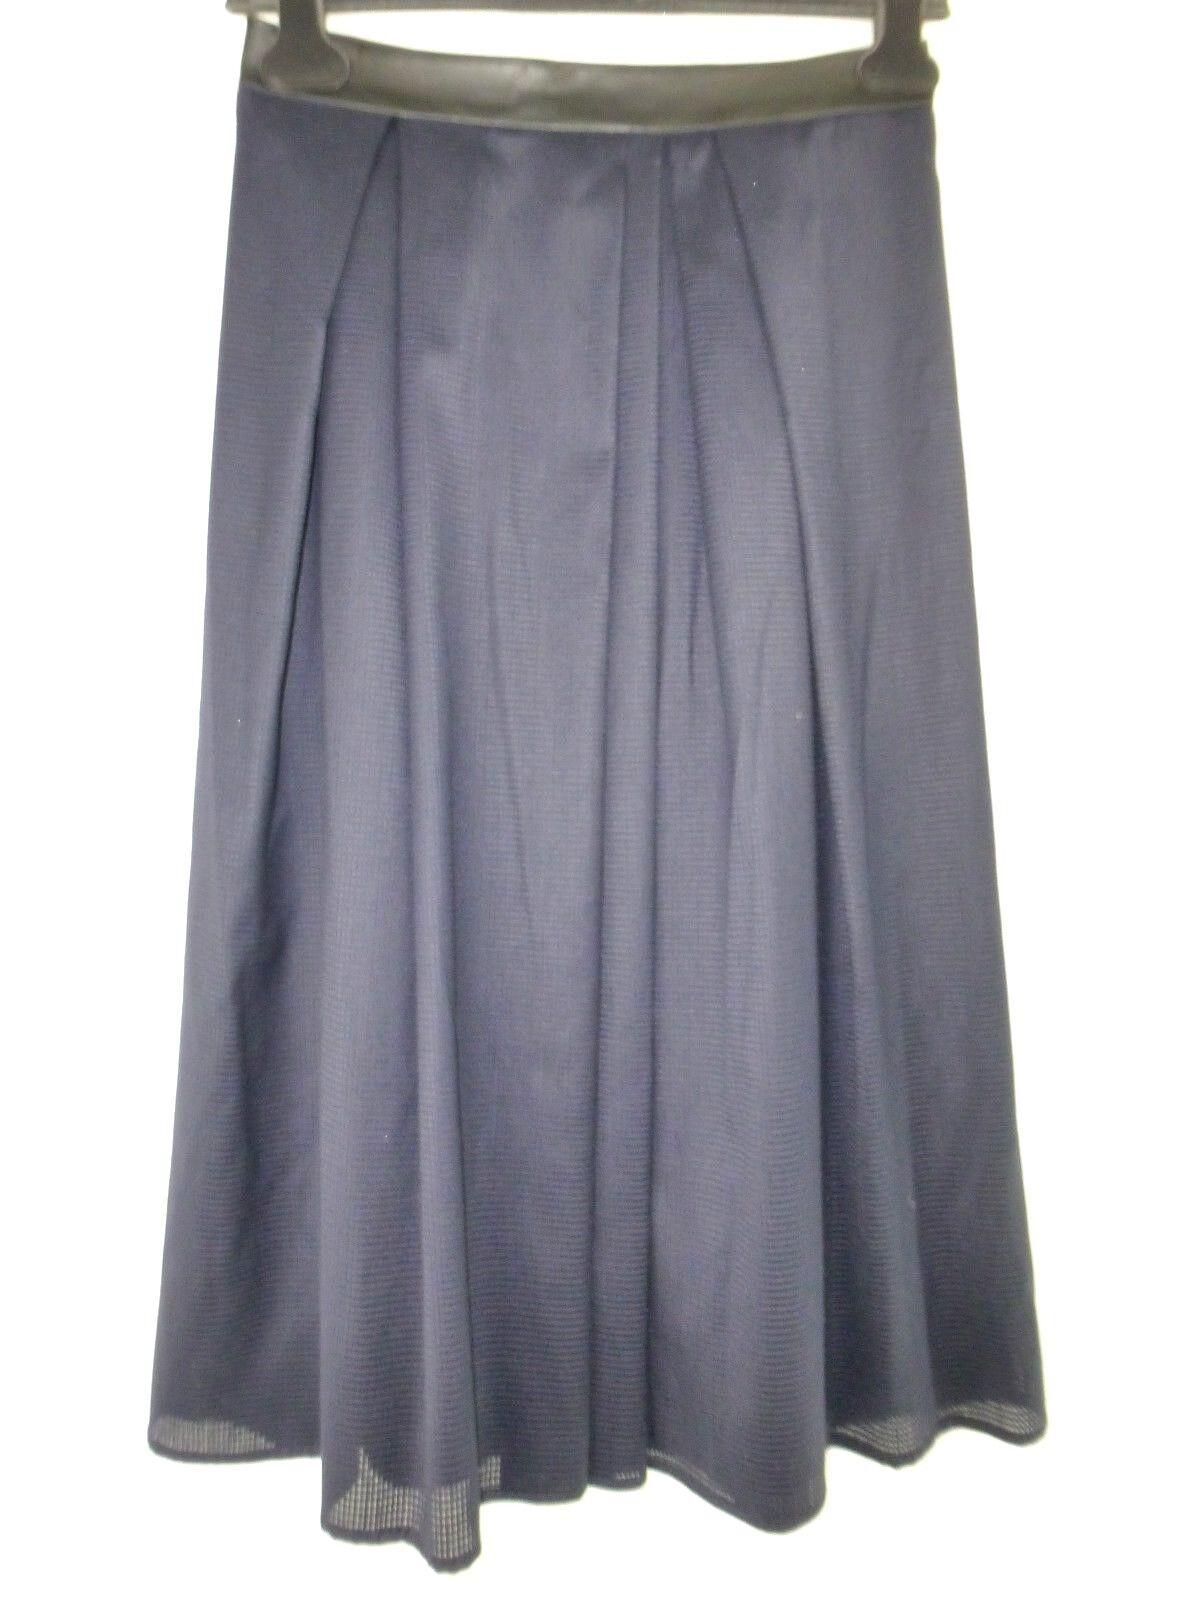 Iheart Ladies Skirt Nikita S 36 A-Shape bluee Faux Leather Waistband